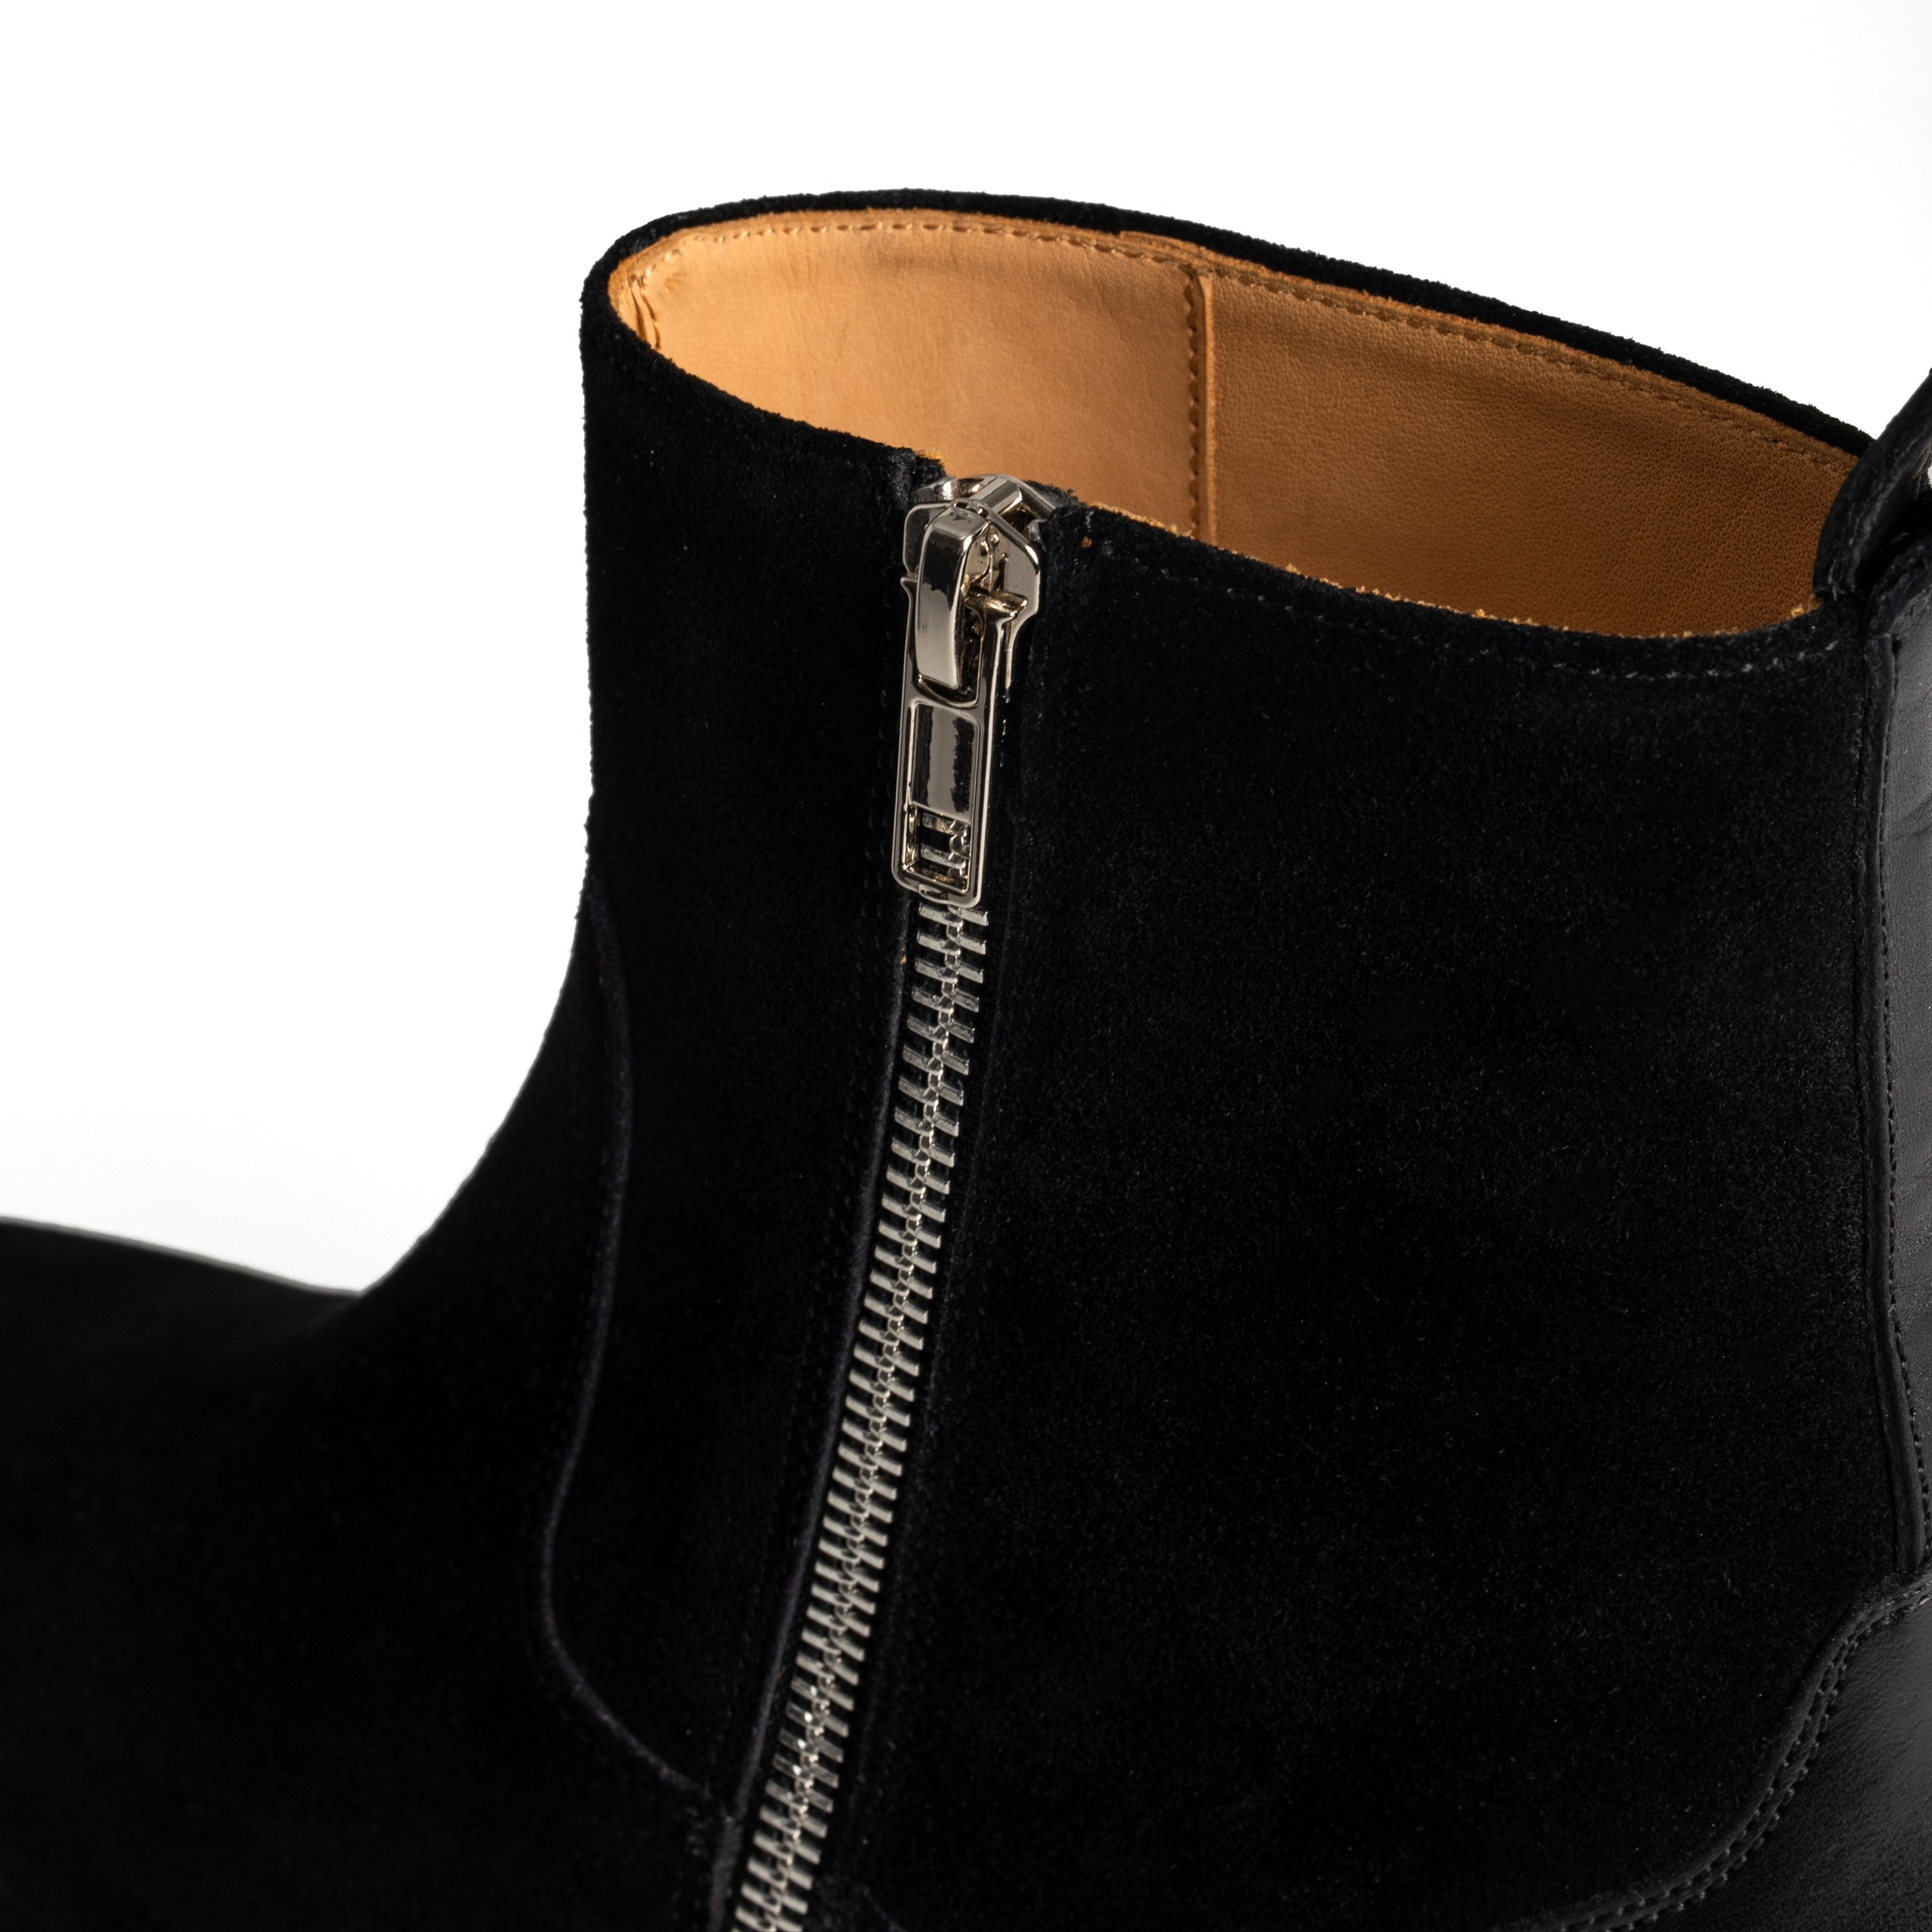 Zipped Leather Heel Chelsea Boots